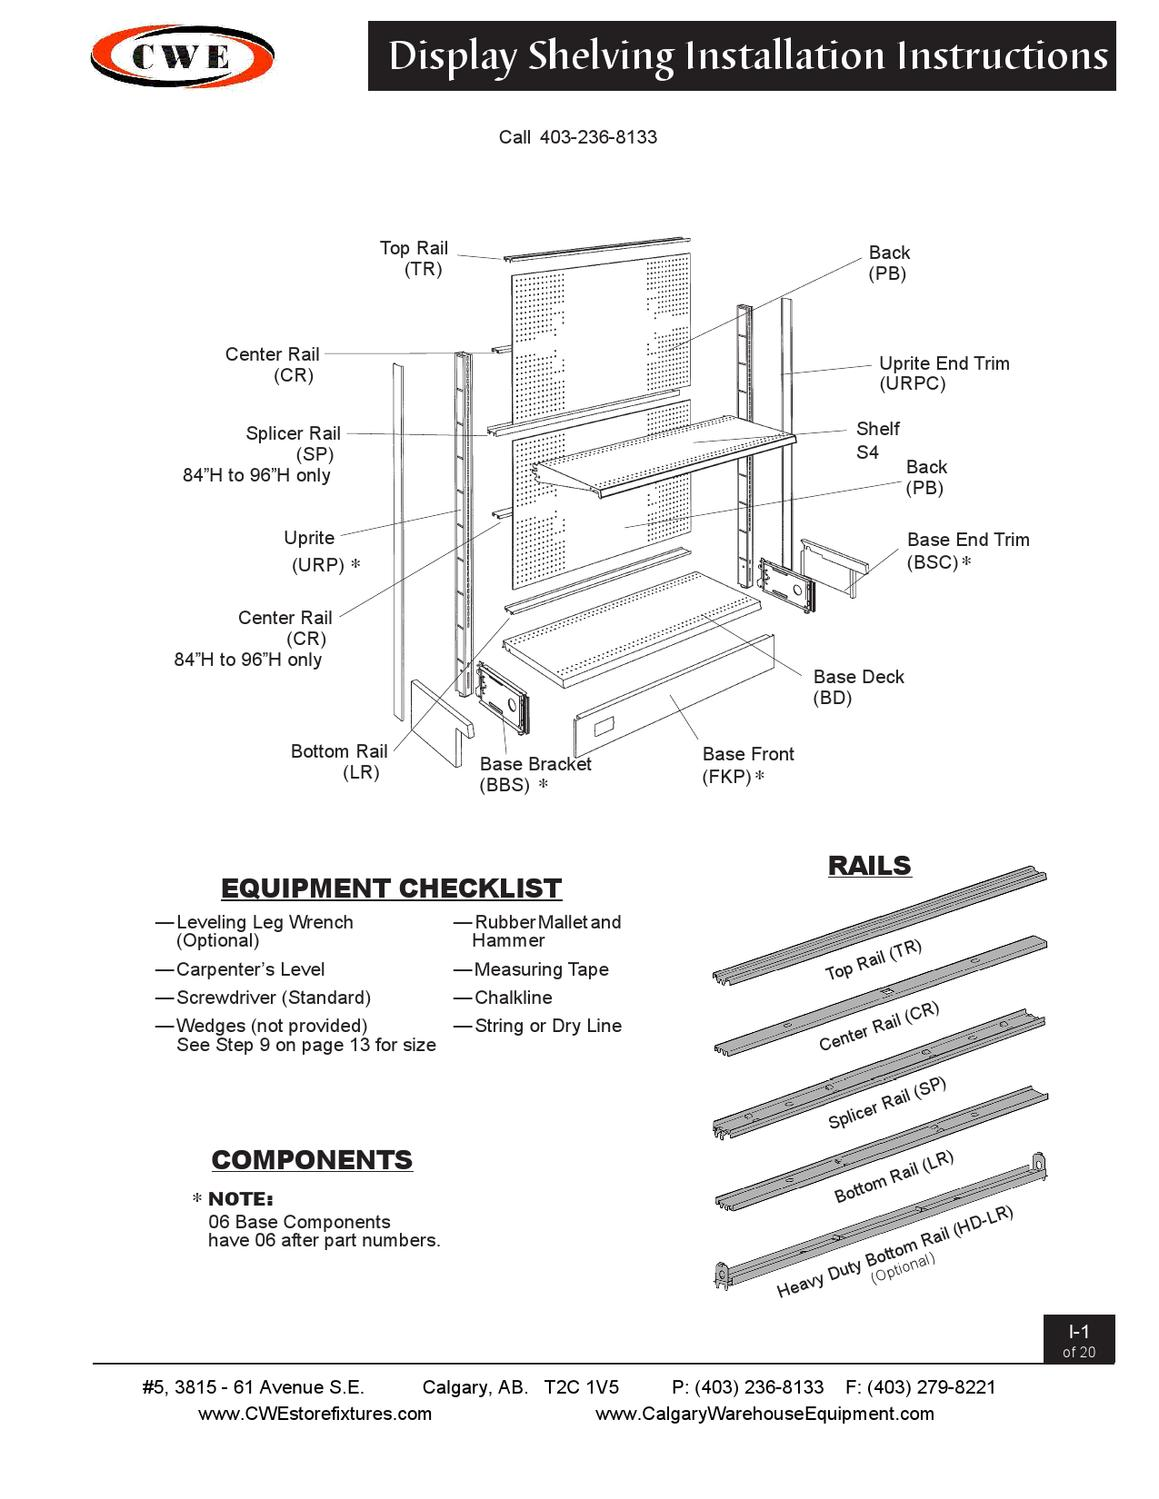 Gondola Setup Instructions By Calgary Warehouse Equipment